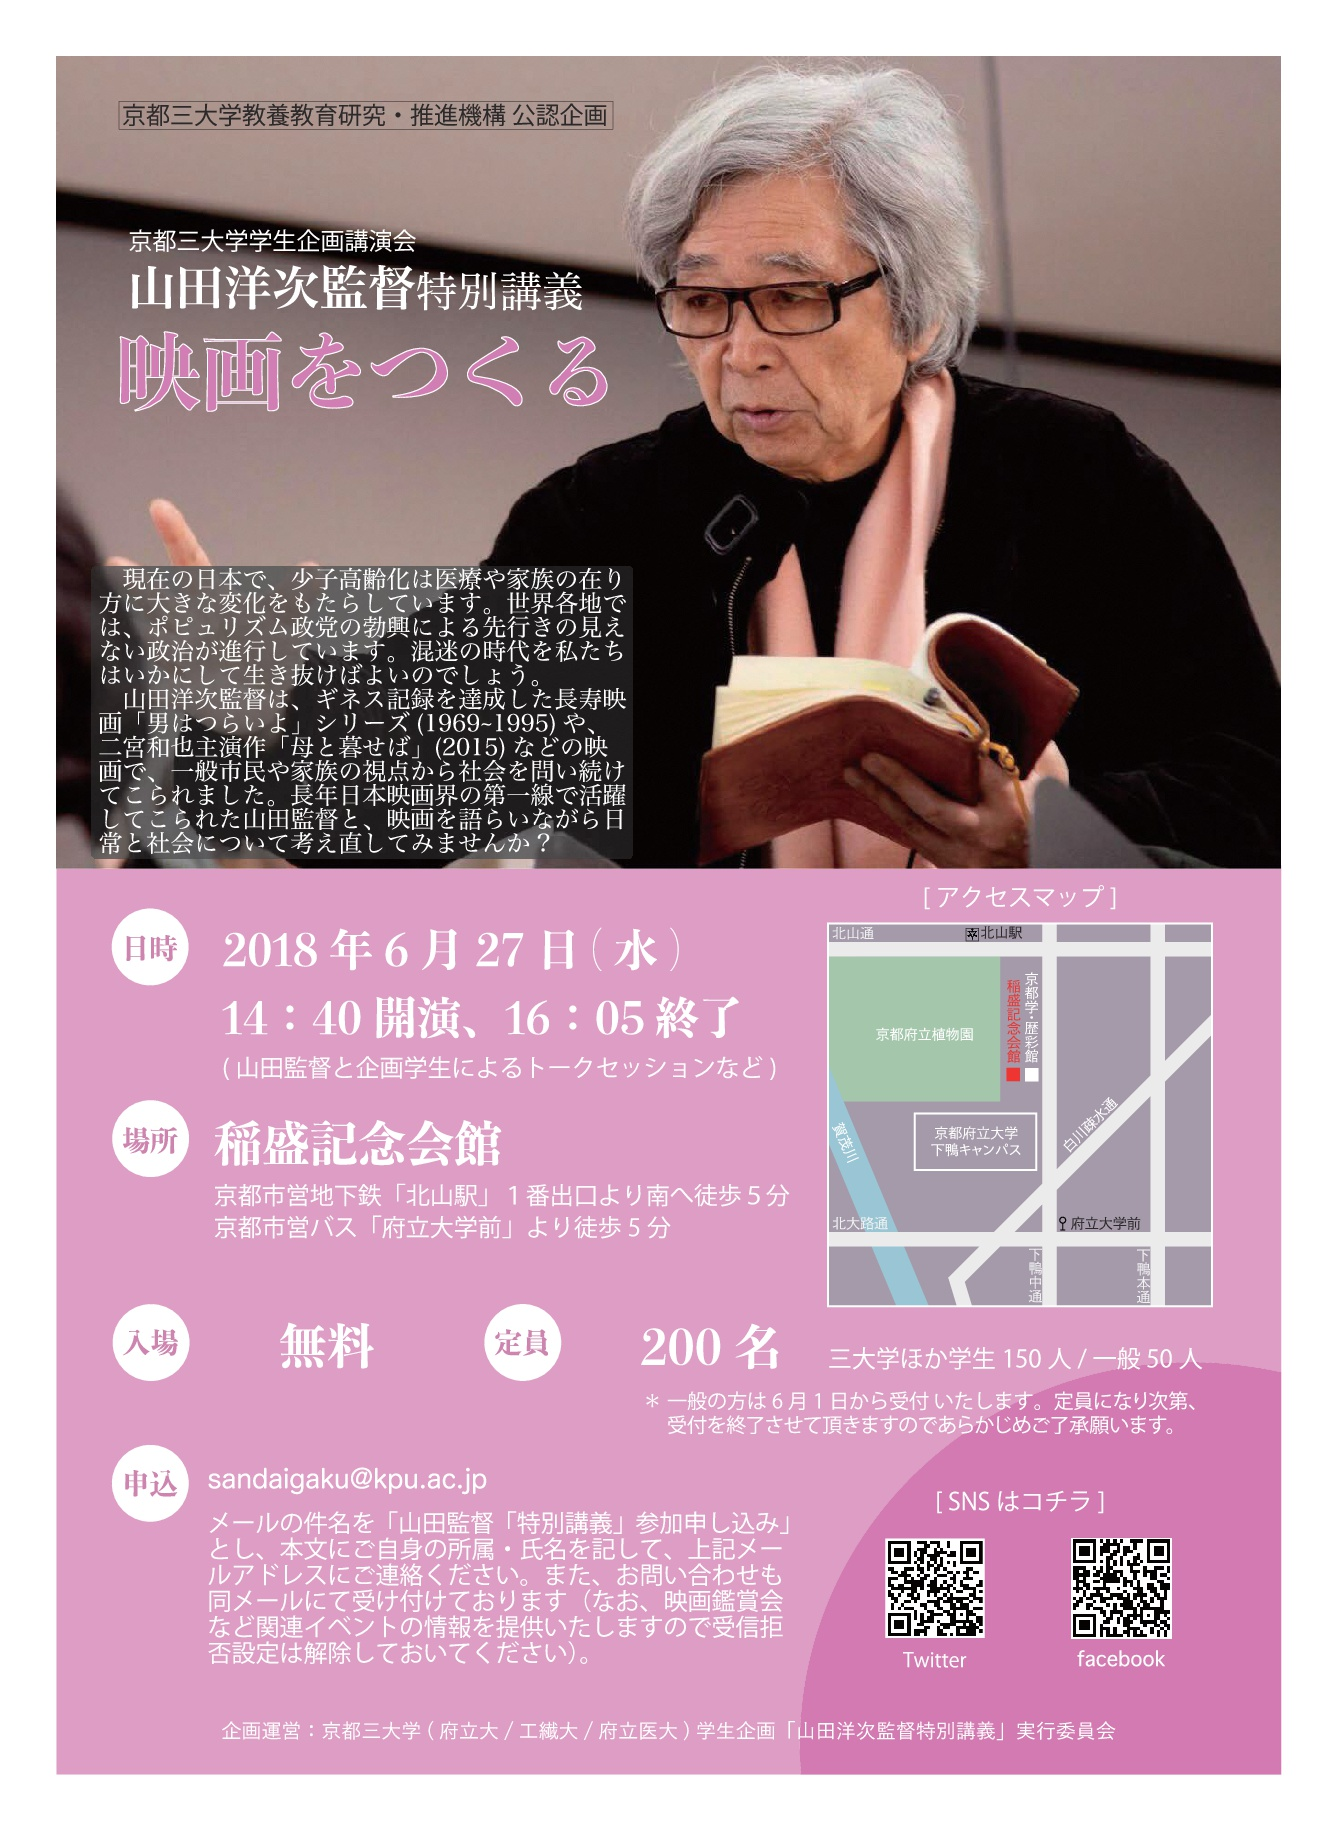 【参加者募集中】京都三大学学生企画講演会 山田洋次監督特別講義「映画をつくる」